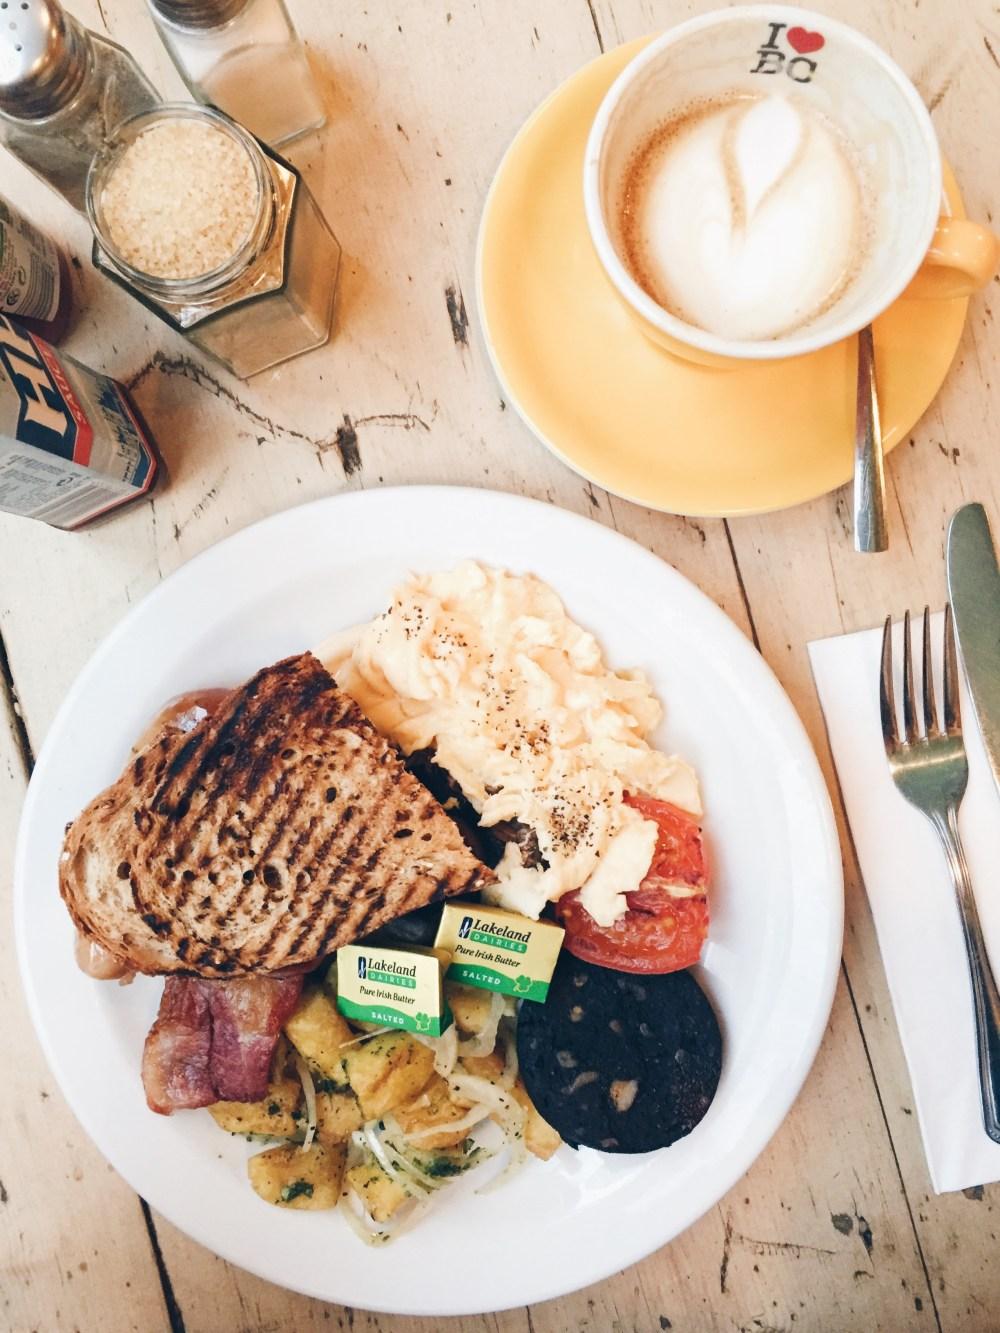 11 Dec 2016: The Full Monty @ The Breakfast Club   London, England